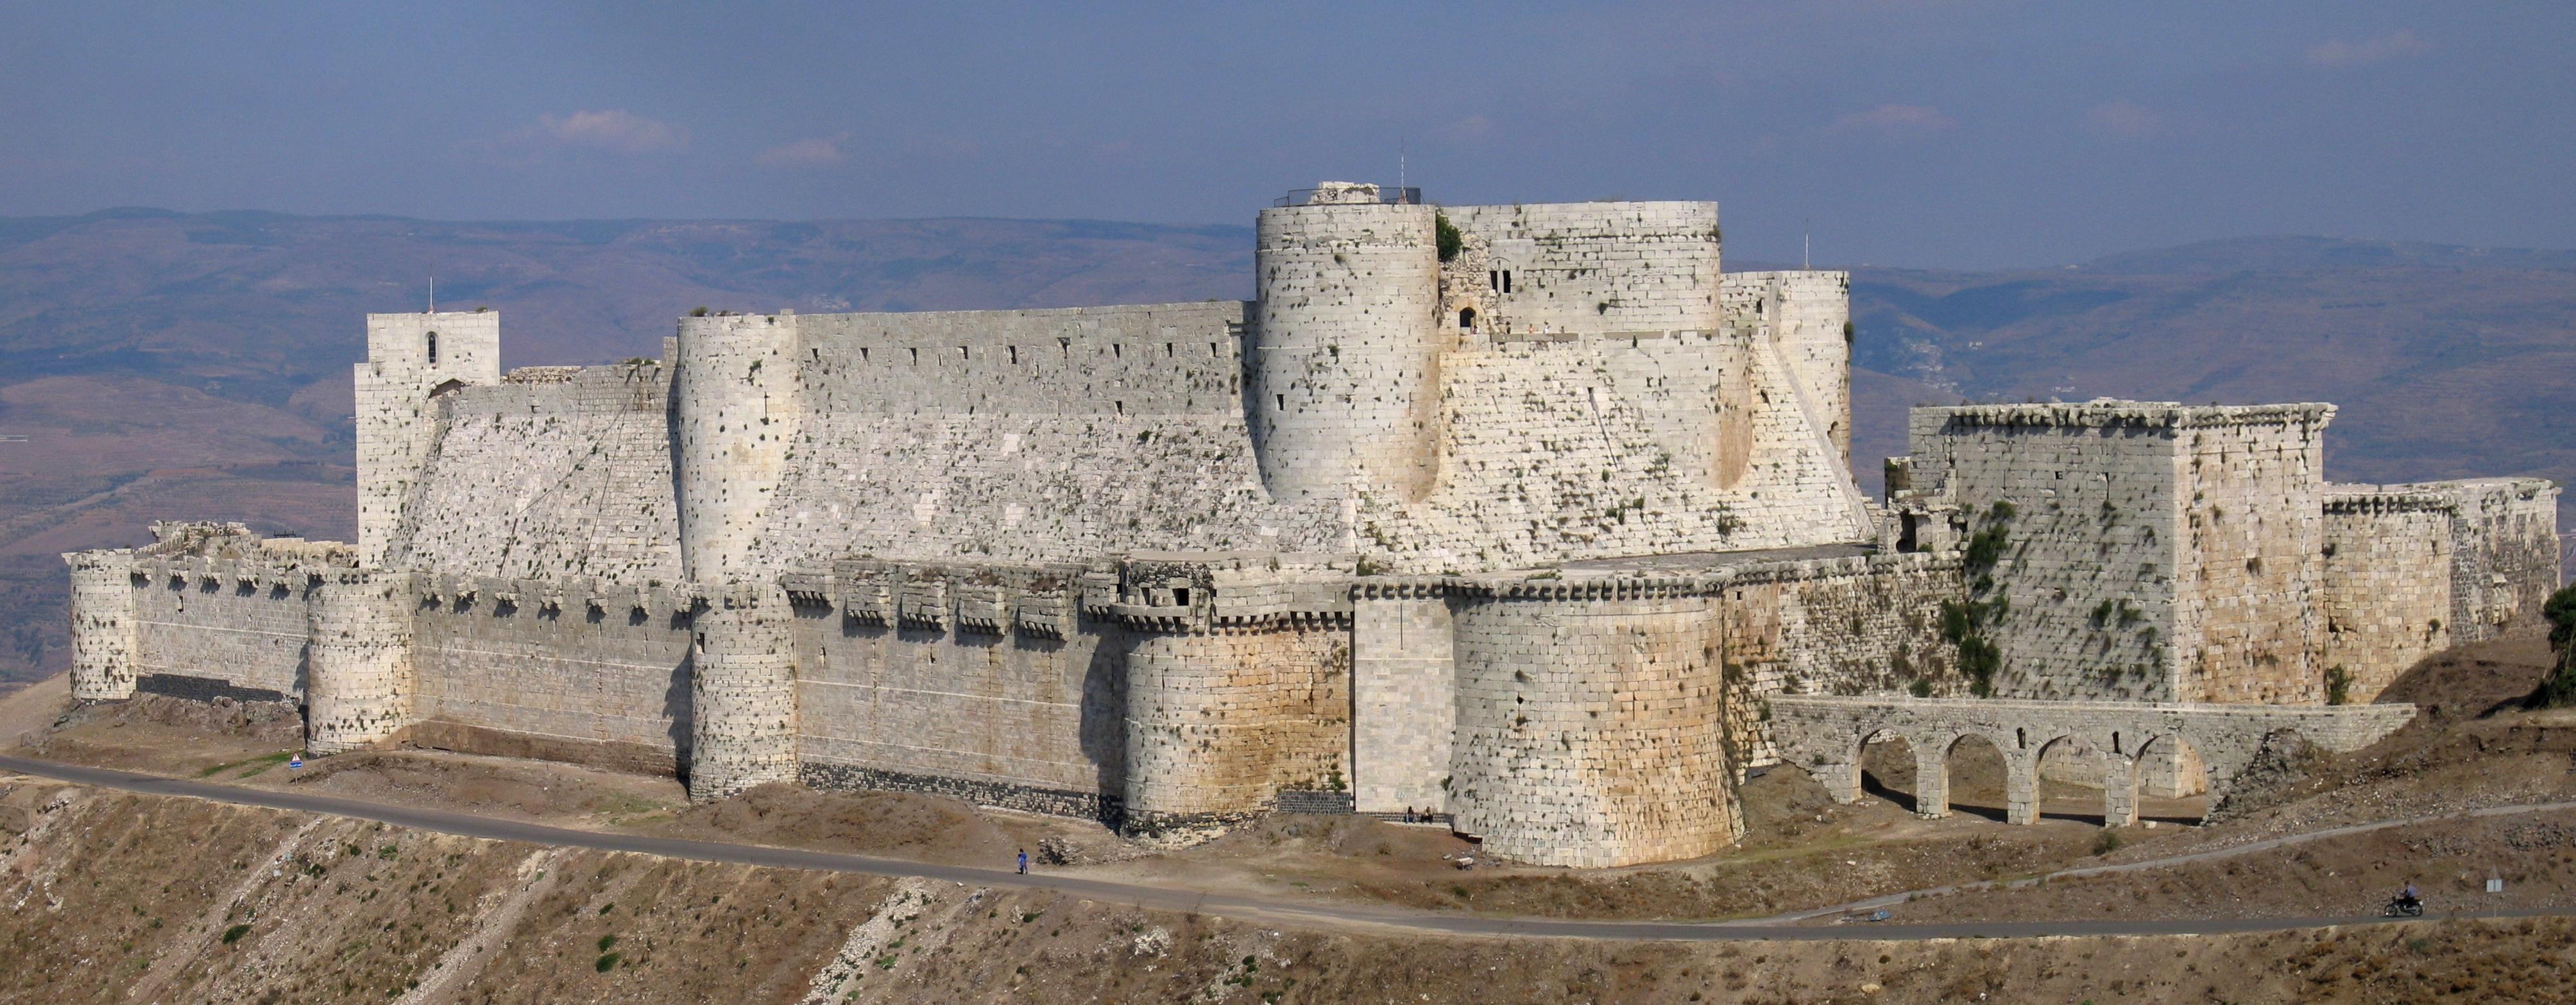 https://i1.wp.com/upload.wikimedia.org/wikipedia/commons/5/5a/Crac_des_chevaliers_syria.jpeg